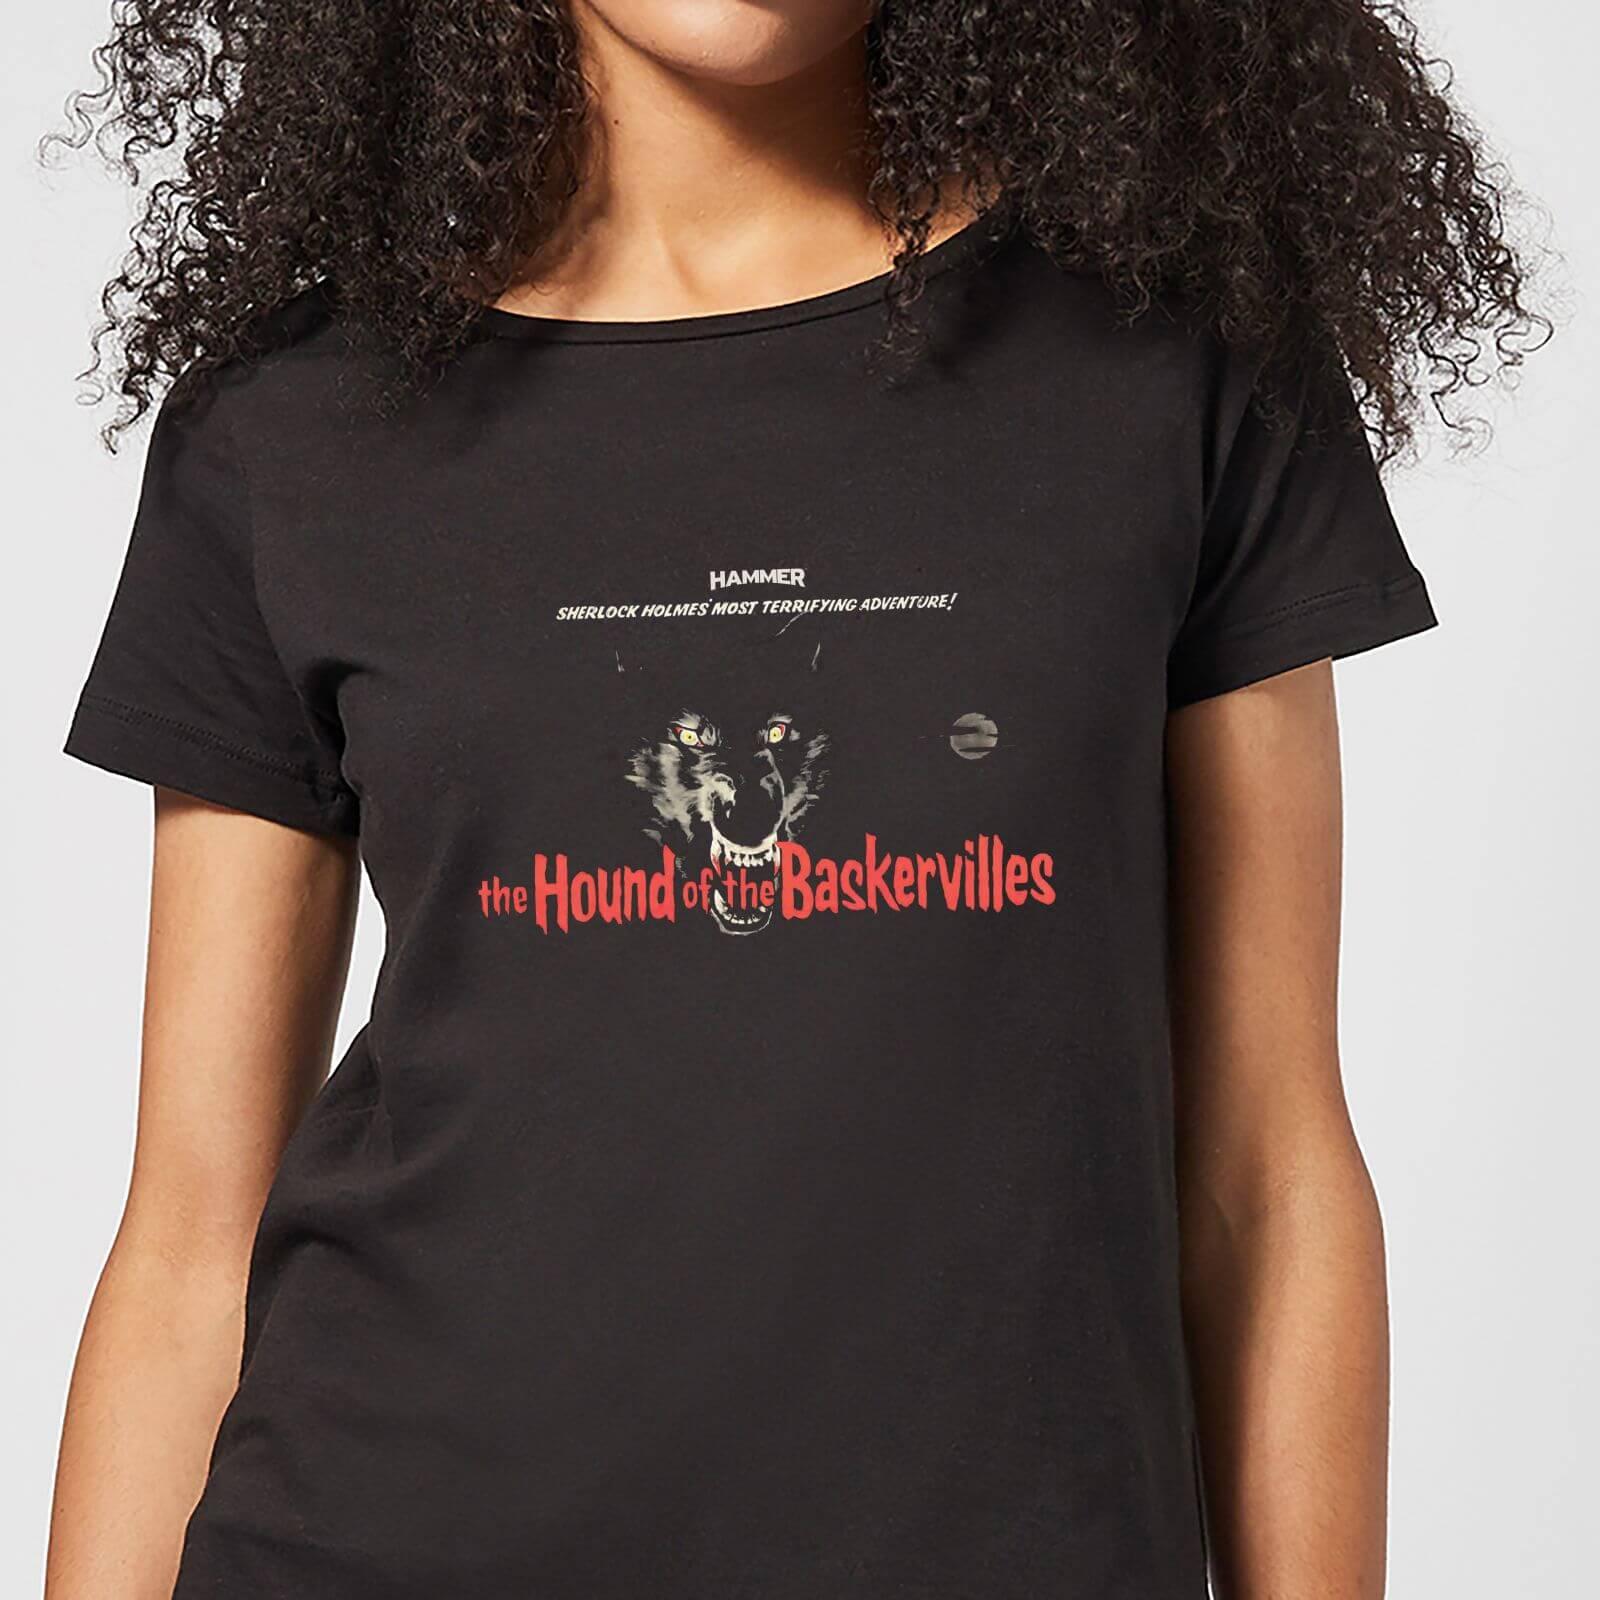 Hammer Horror Hound Of The Baskervilles Women's T-Shirt - Black - XS - Black